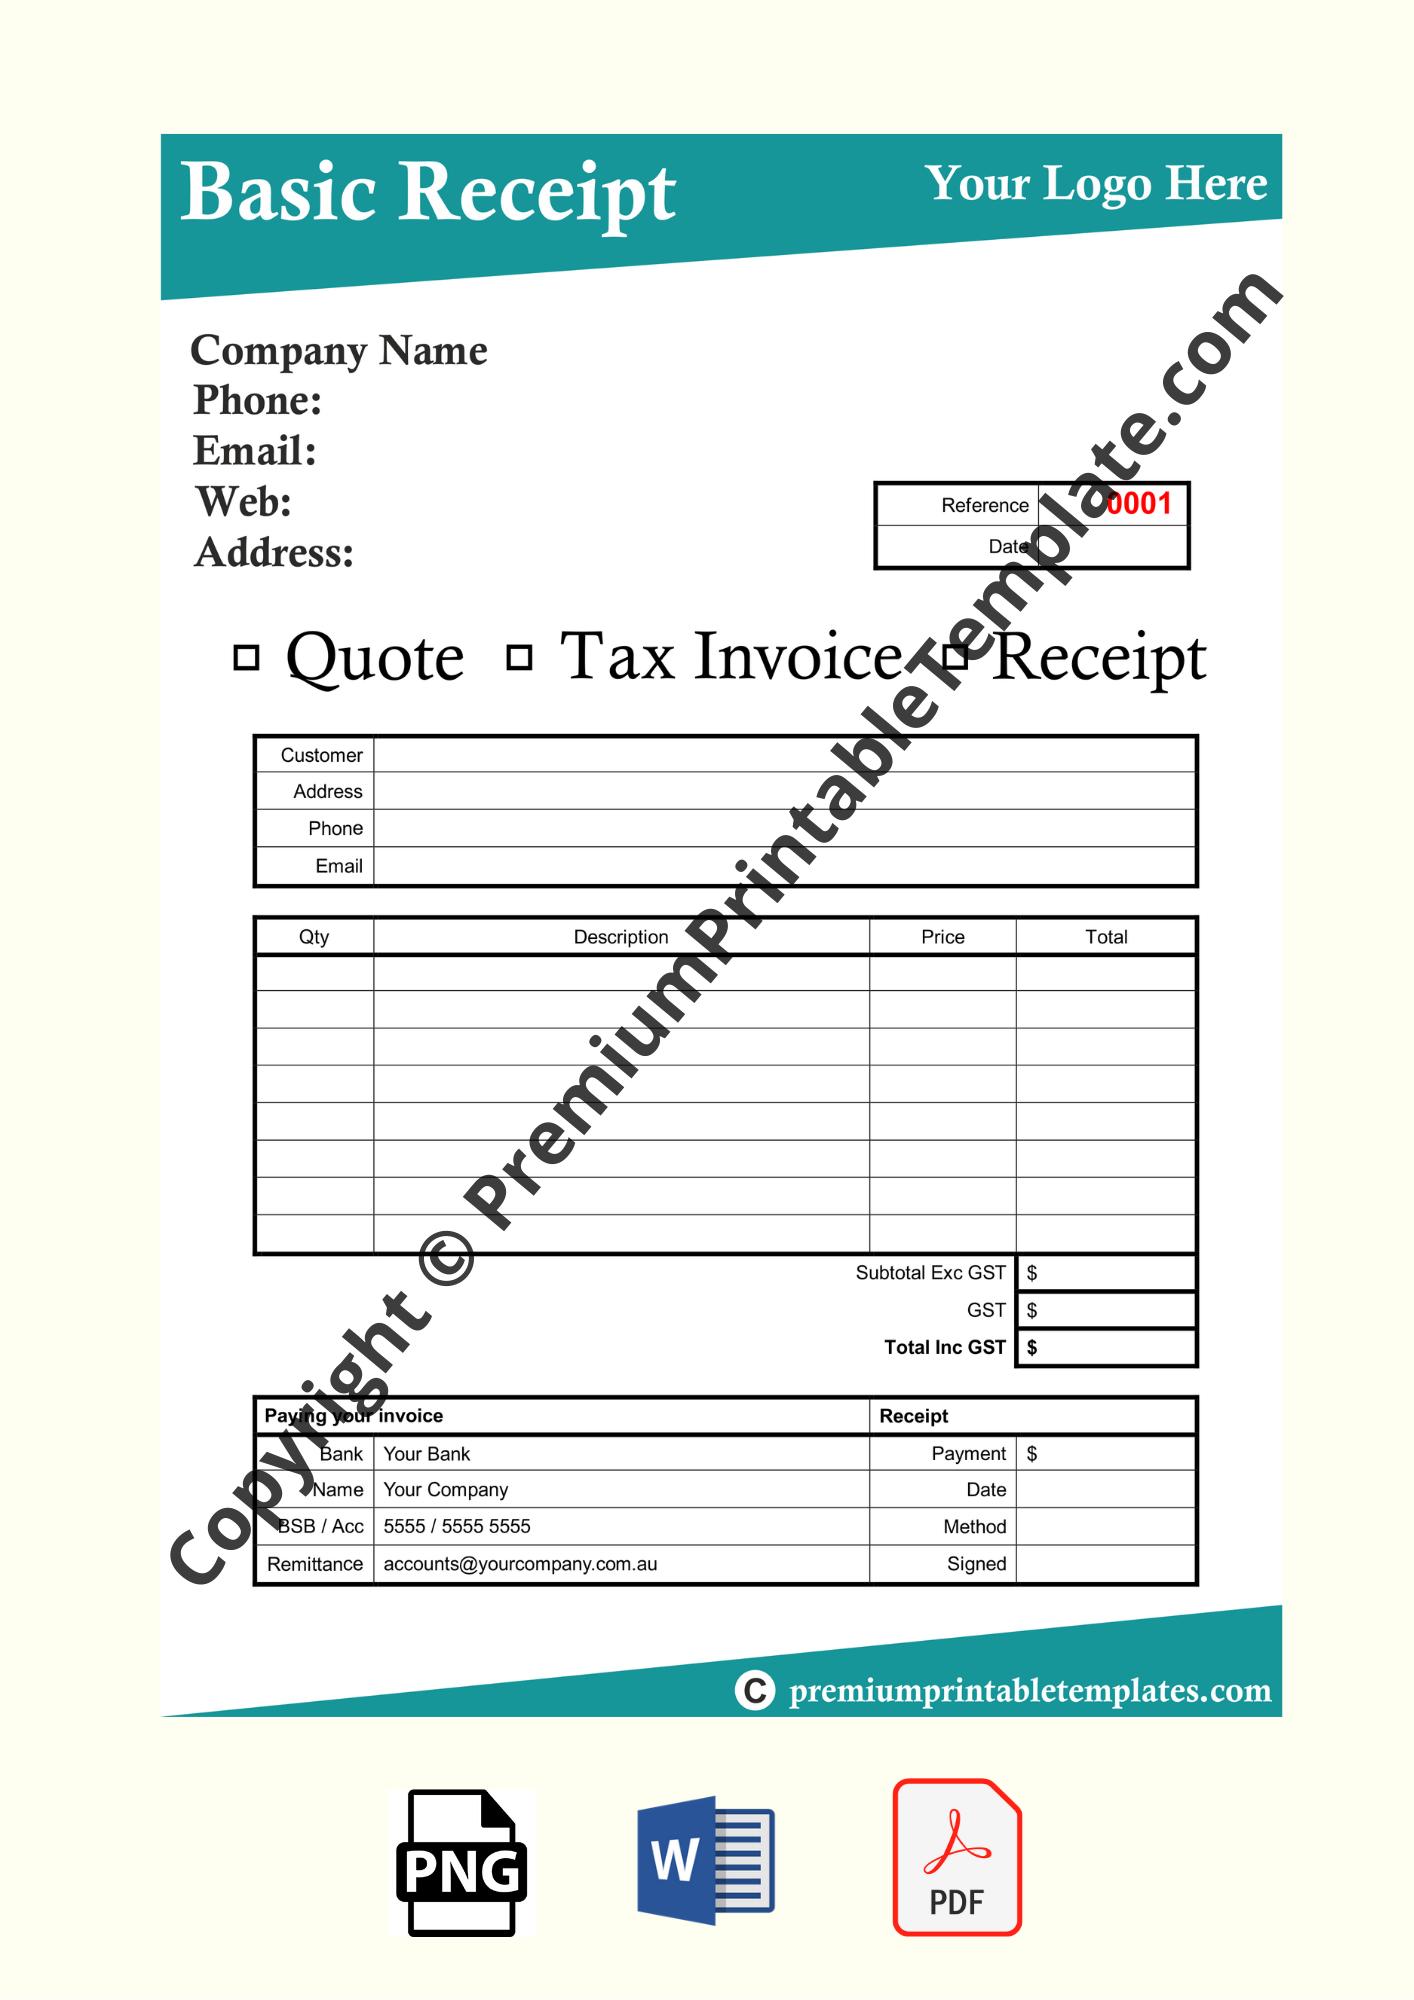 basic receipt template